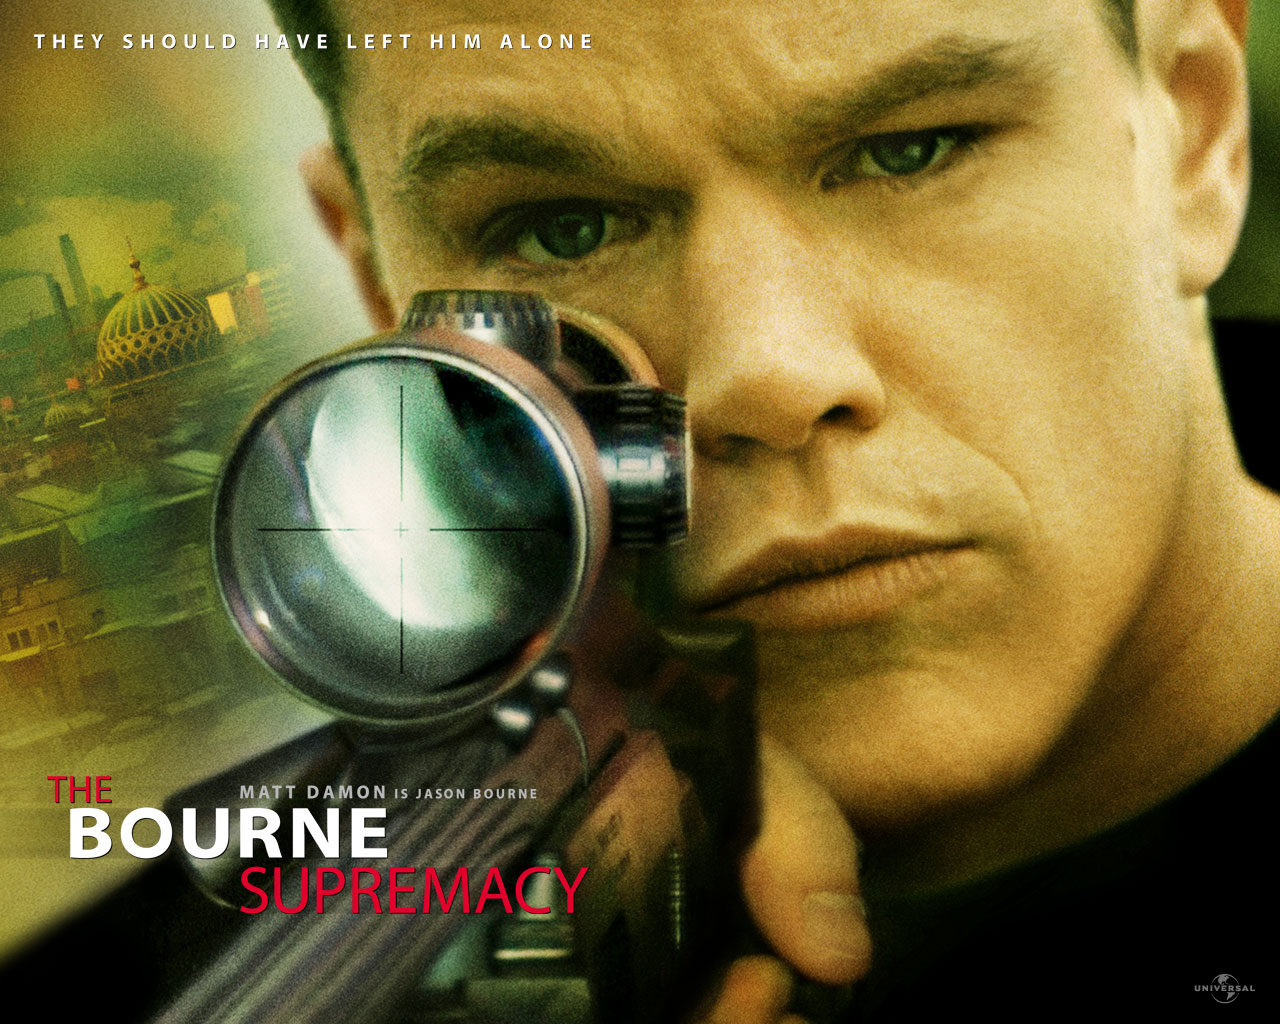 http://4.bp.blogspot.com/-UX1yD5dfHPA/TtOqkRGgxzI/AAAAAAAAH-U/i7o7tNJNWz8/s1600/Jason_Bourne.jpg